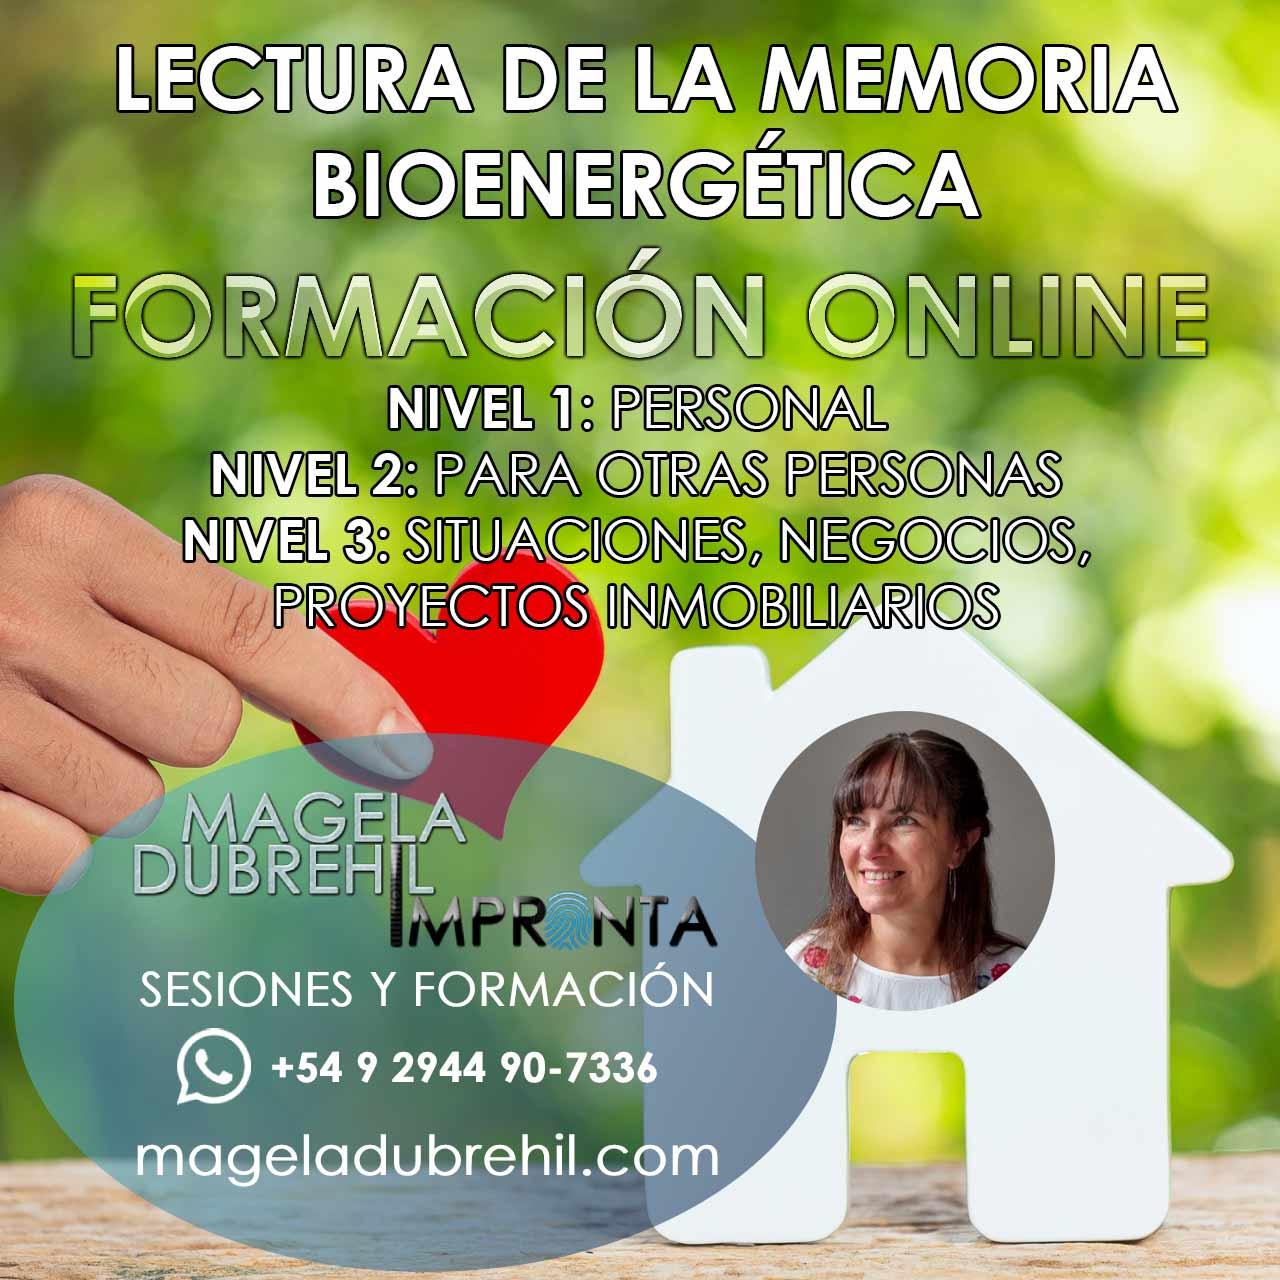 LECTURA DE MEMORIA BIOENERGETICA FORMACIÓN ONLINE NIVELES I, II y III